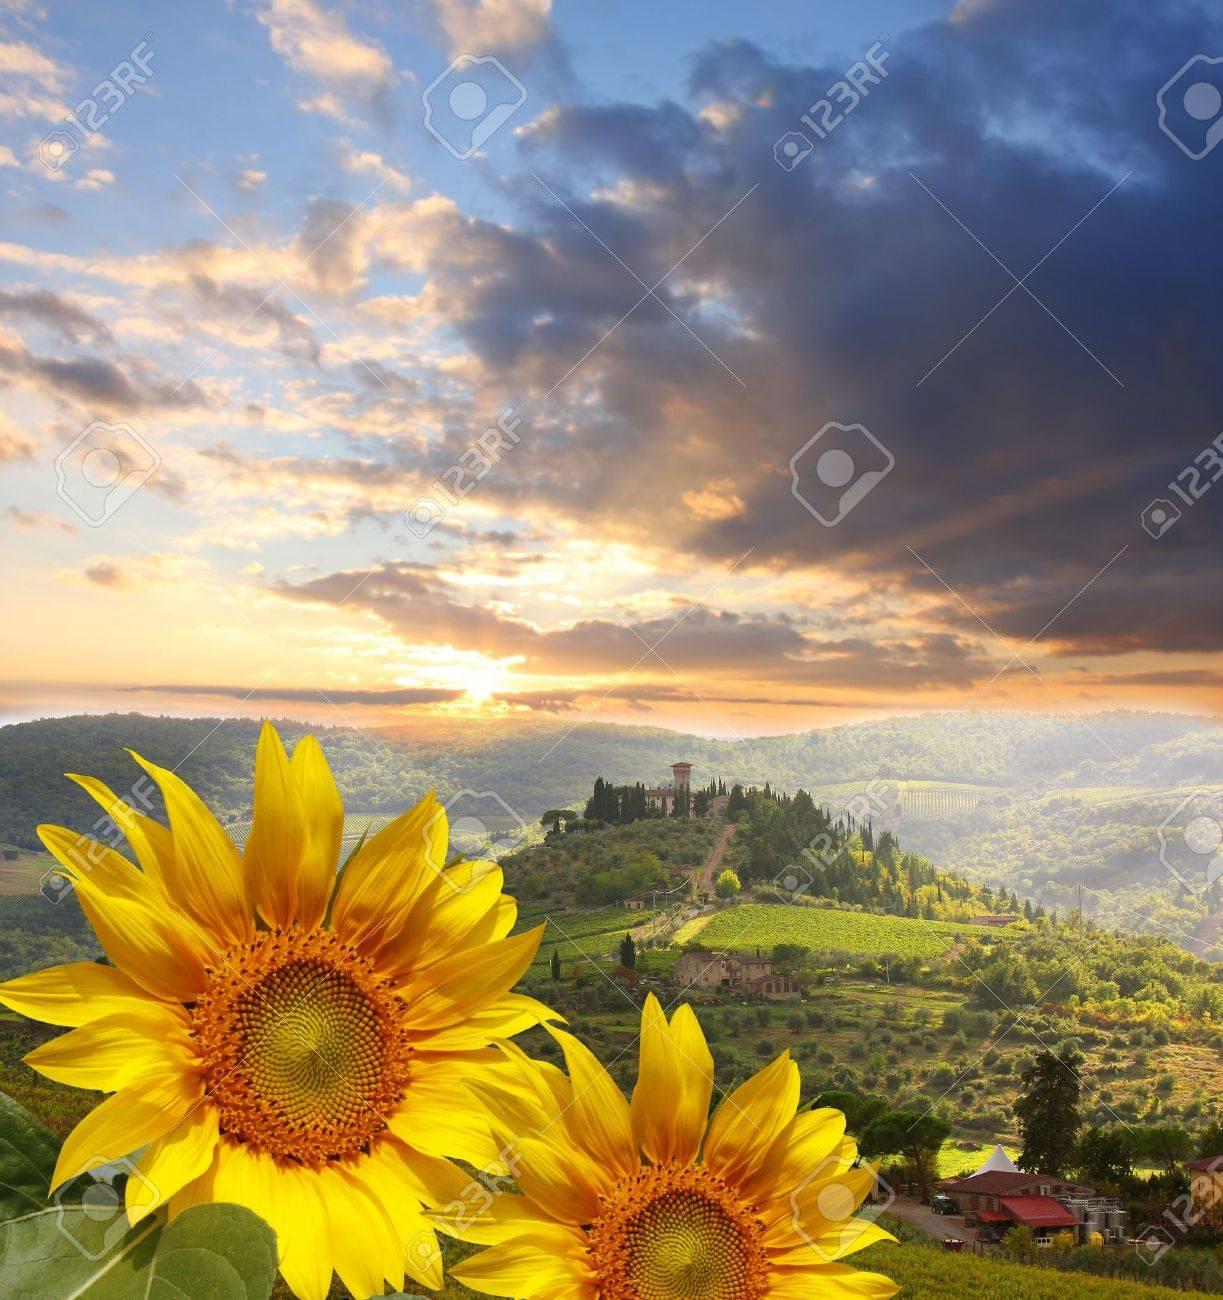 Chianti vineyard landscape in Tuscany, Italy - 15541081